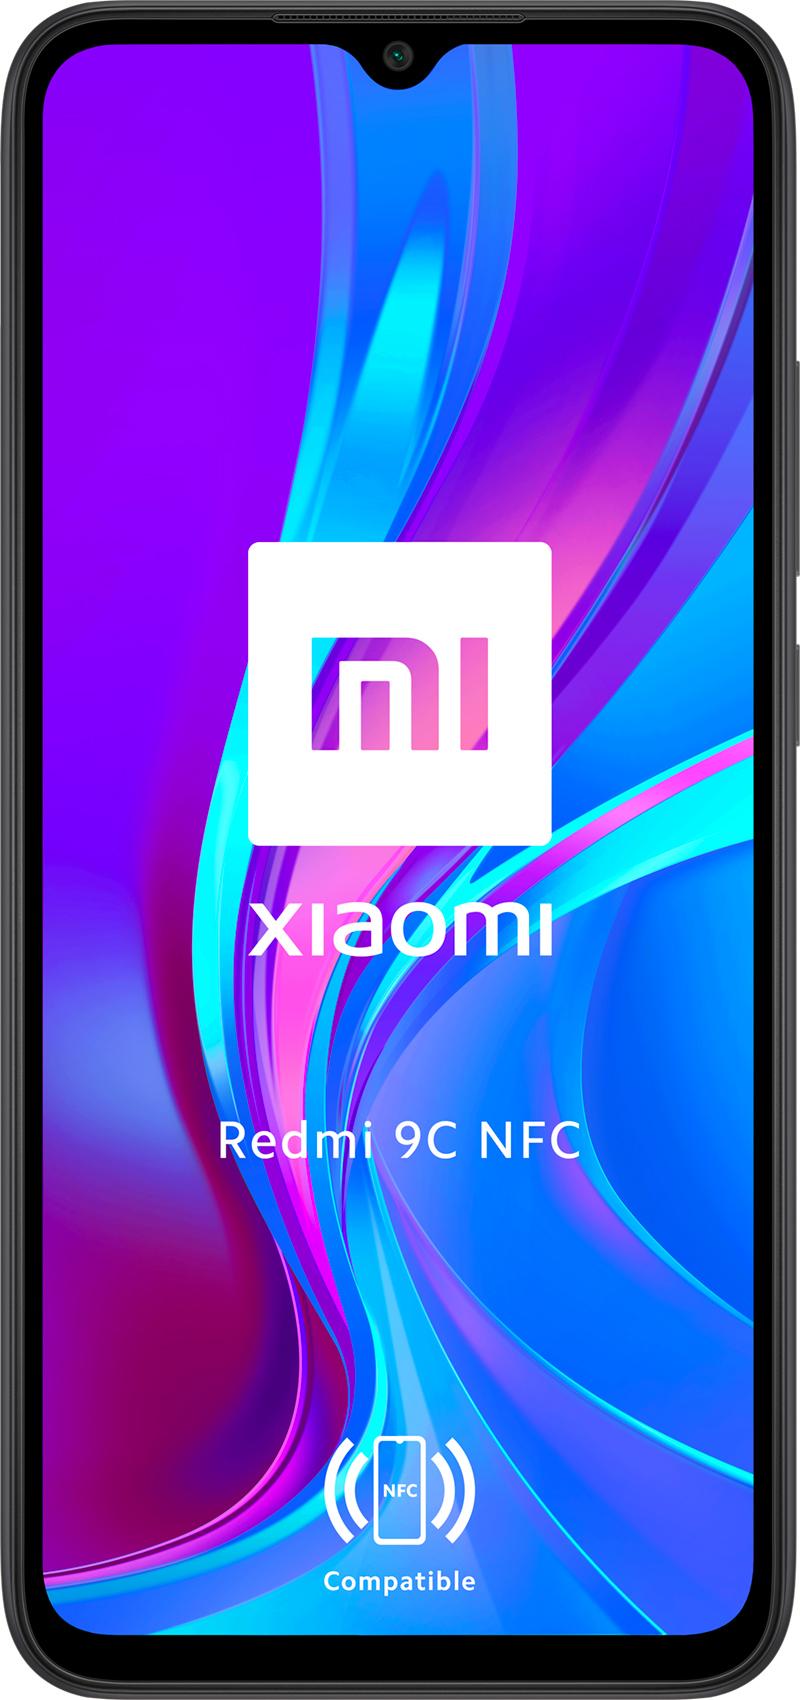 Xiaomi Redmi 9C NFC noir 32Go